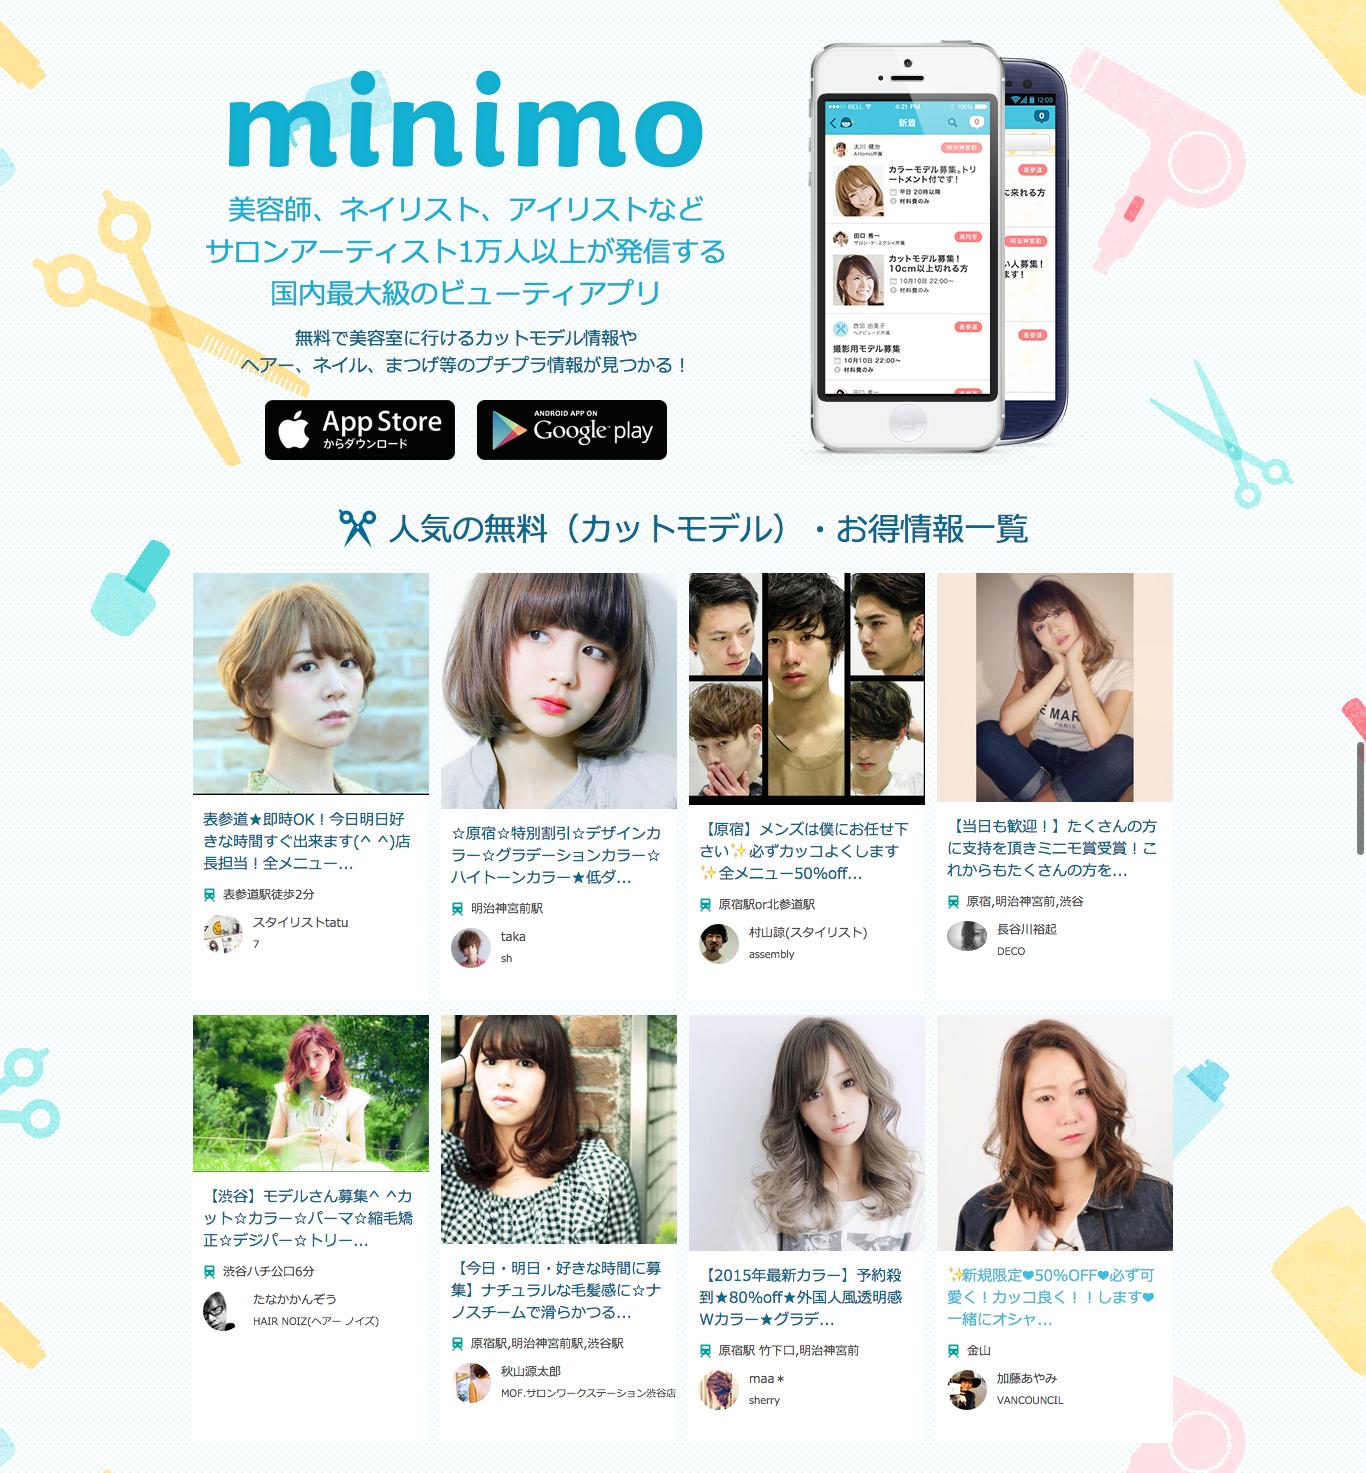 FireShot Capture - ミニモ(minimo)|美容院・美容室のお得情報、無料のカットモデル情報を探して予約できる国内最大級の美容師発信_ - https___minimodel.jp_